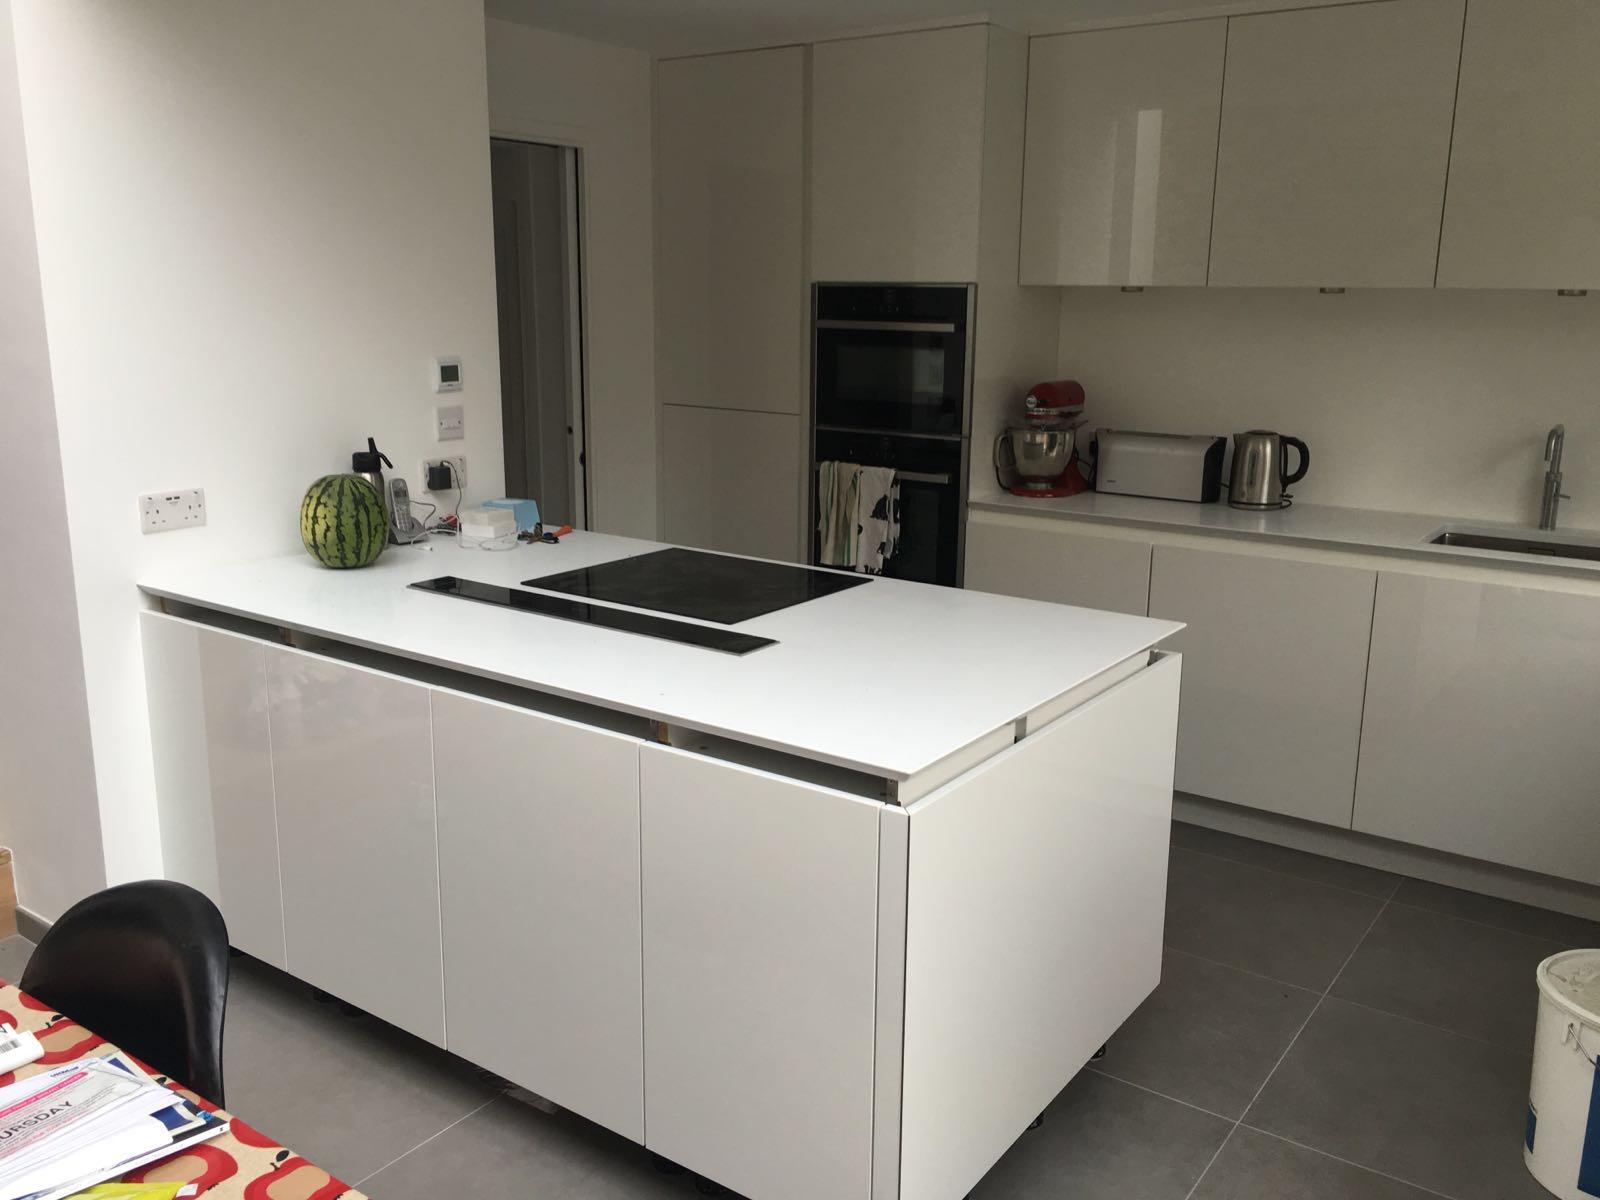 IMG 5195 - Kitchens